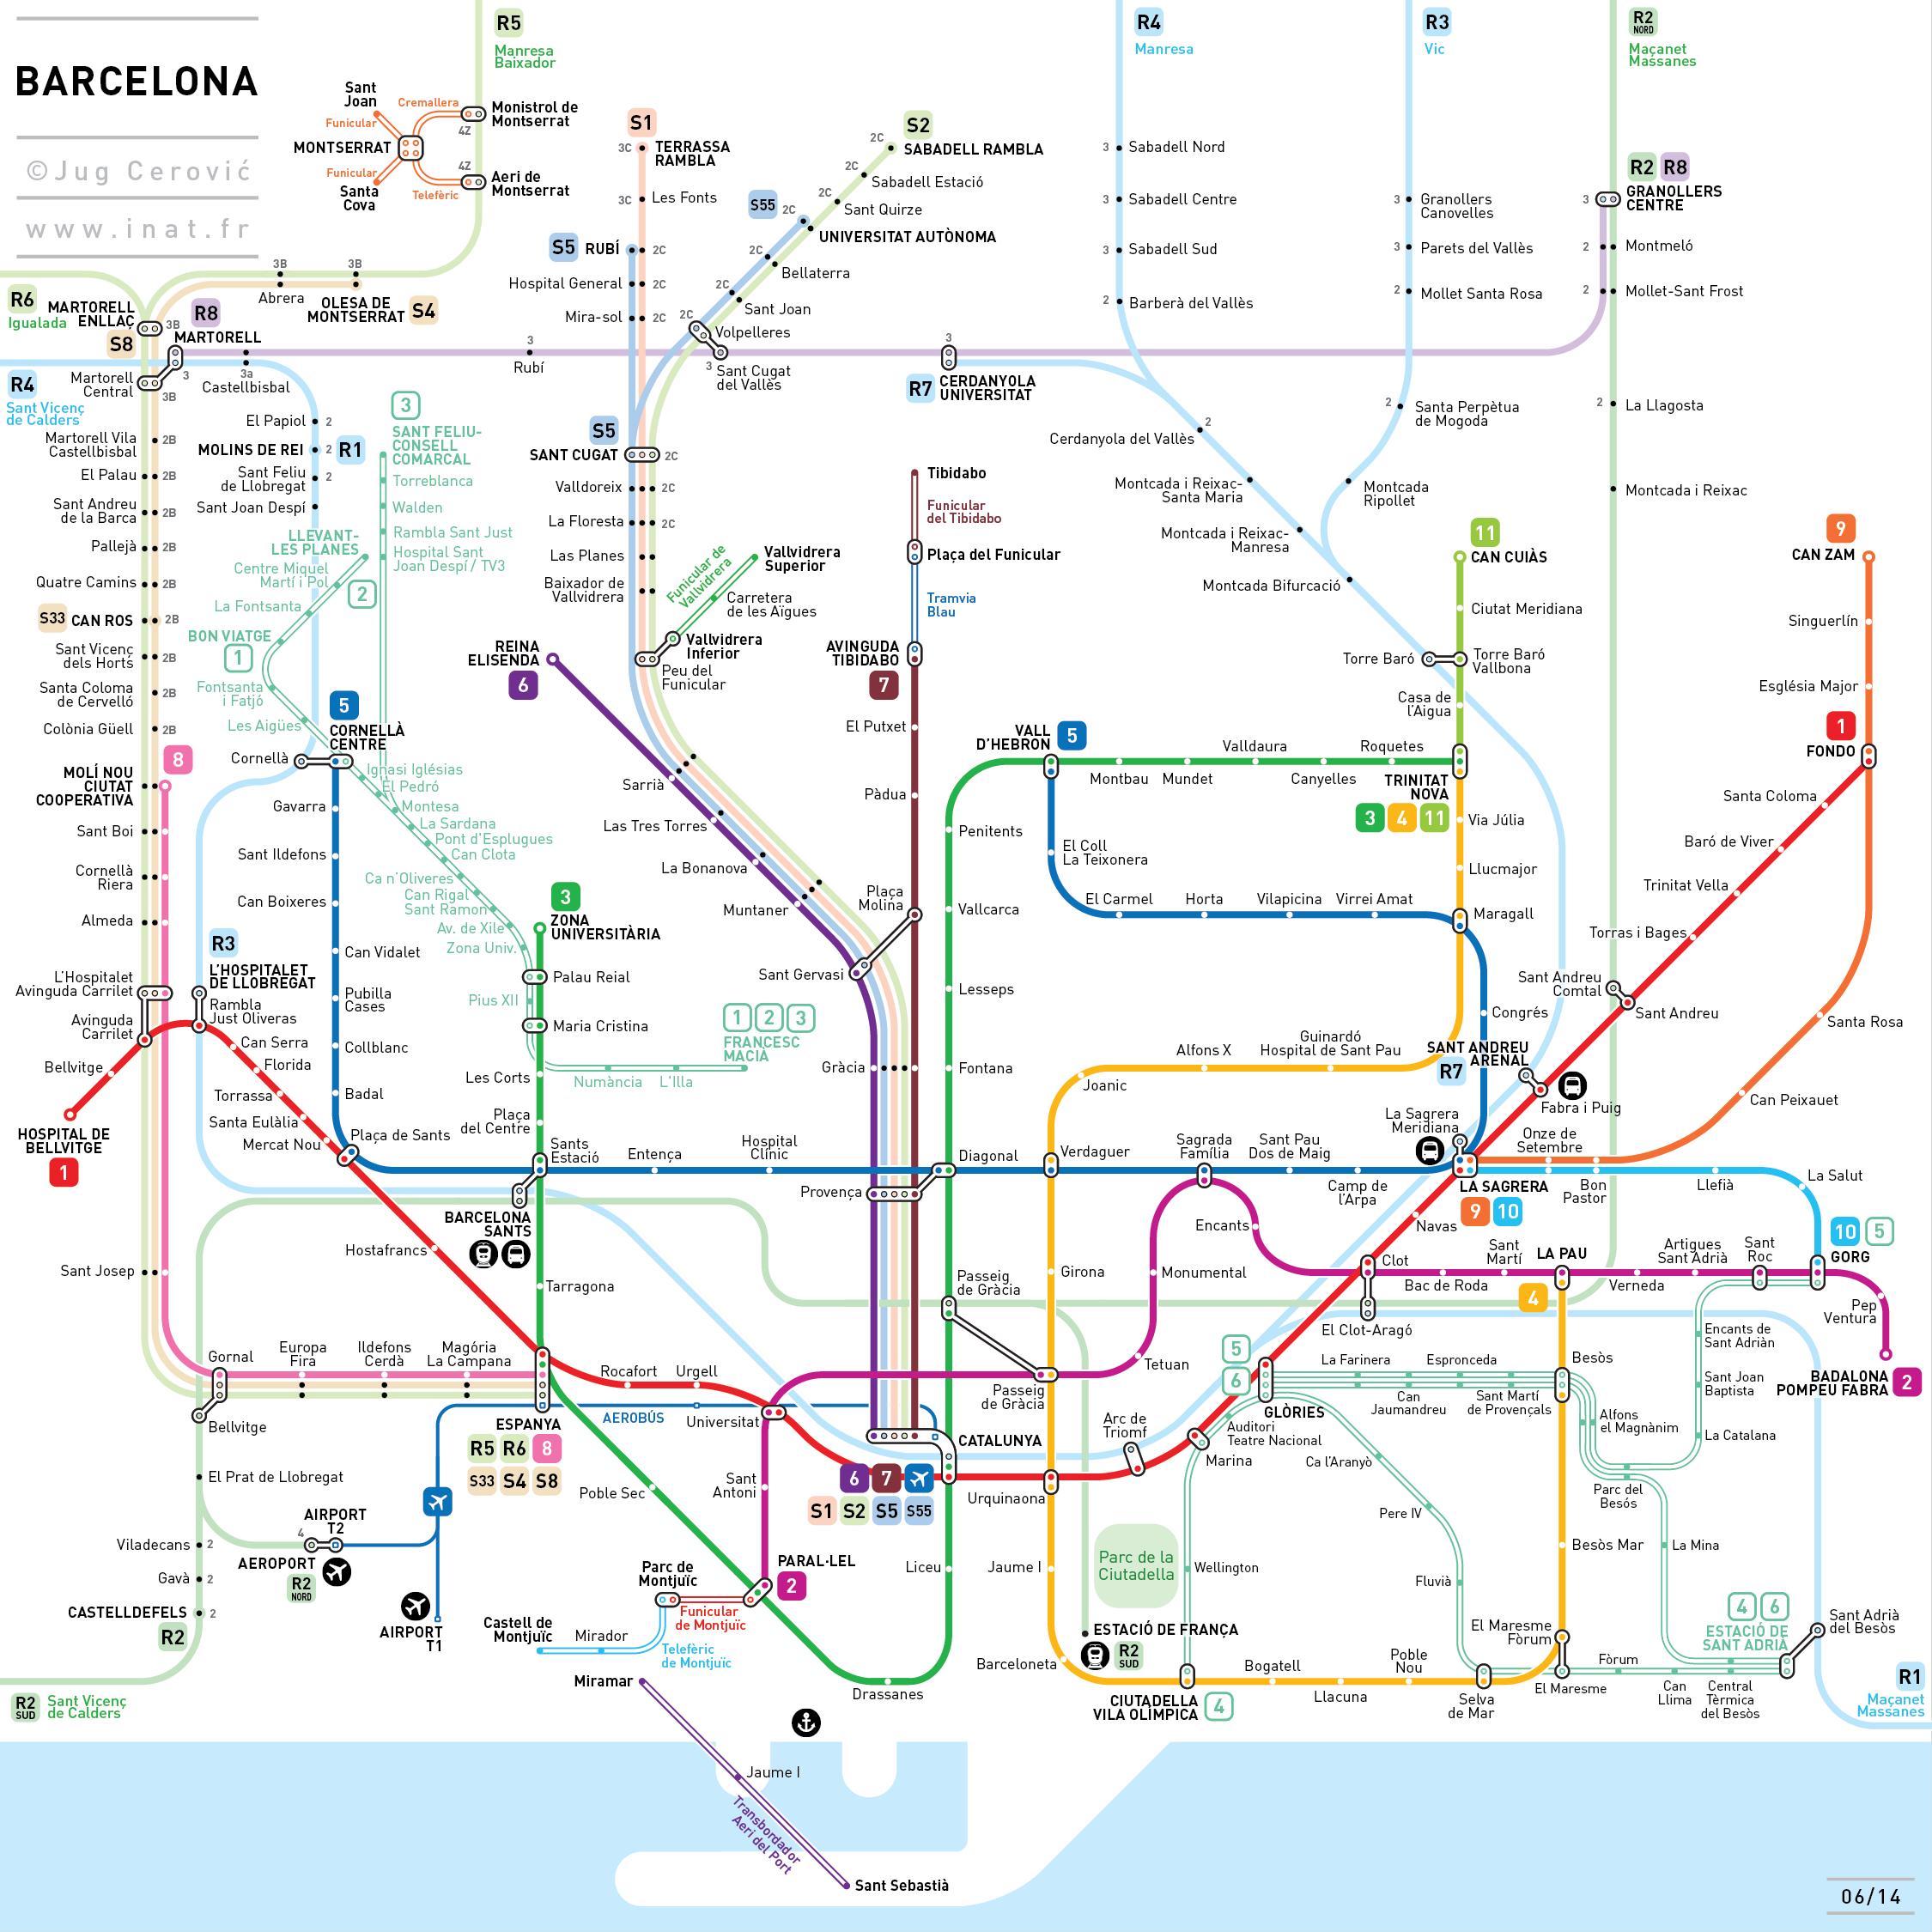 Barcelona Subway Map.Barcelona Metro Map Jug Cerovic Historical Maps Subway Map